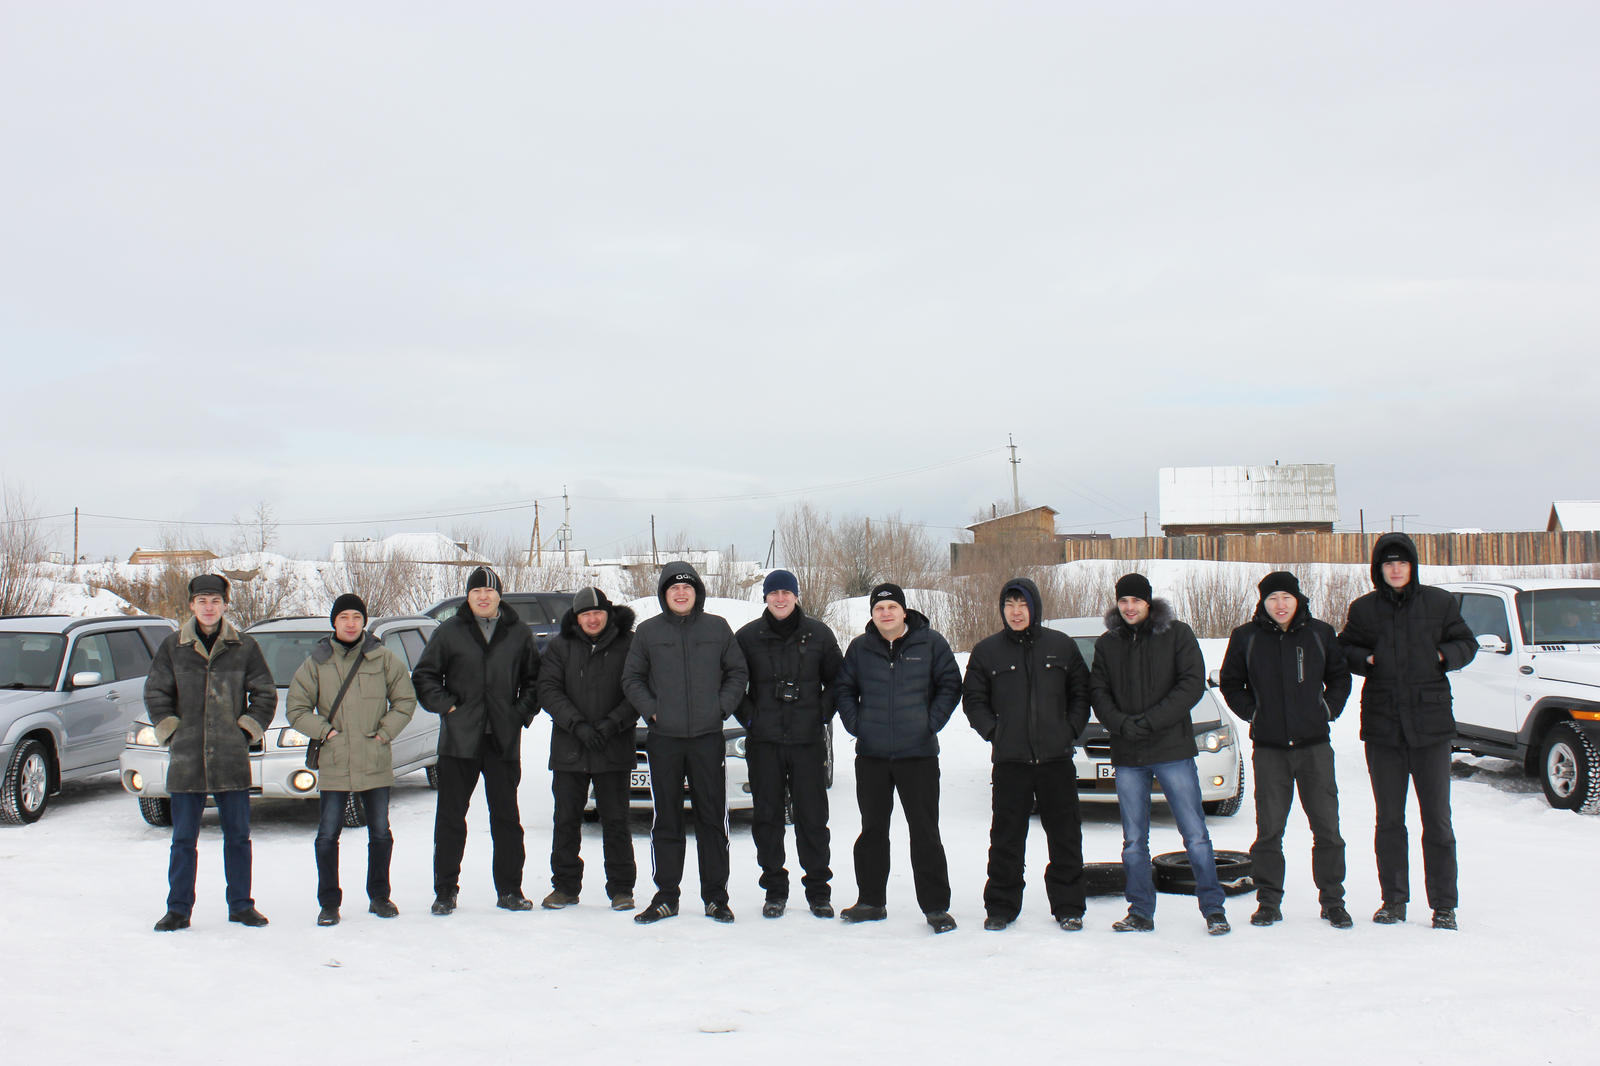 Встреча субаристов Улановки [26 января 2014]